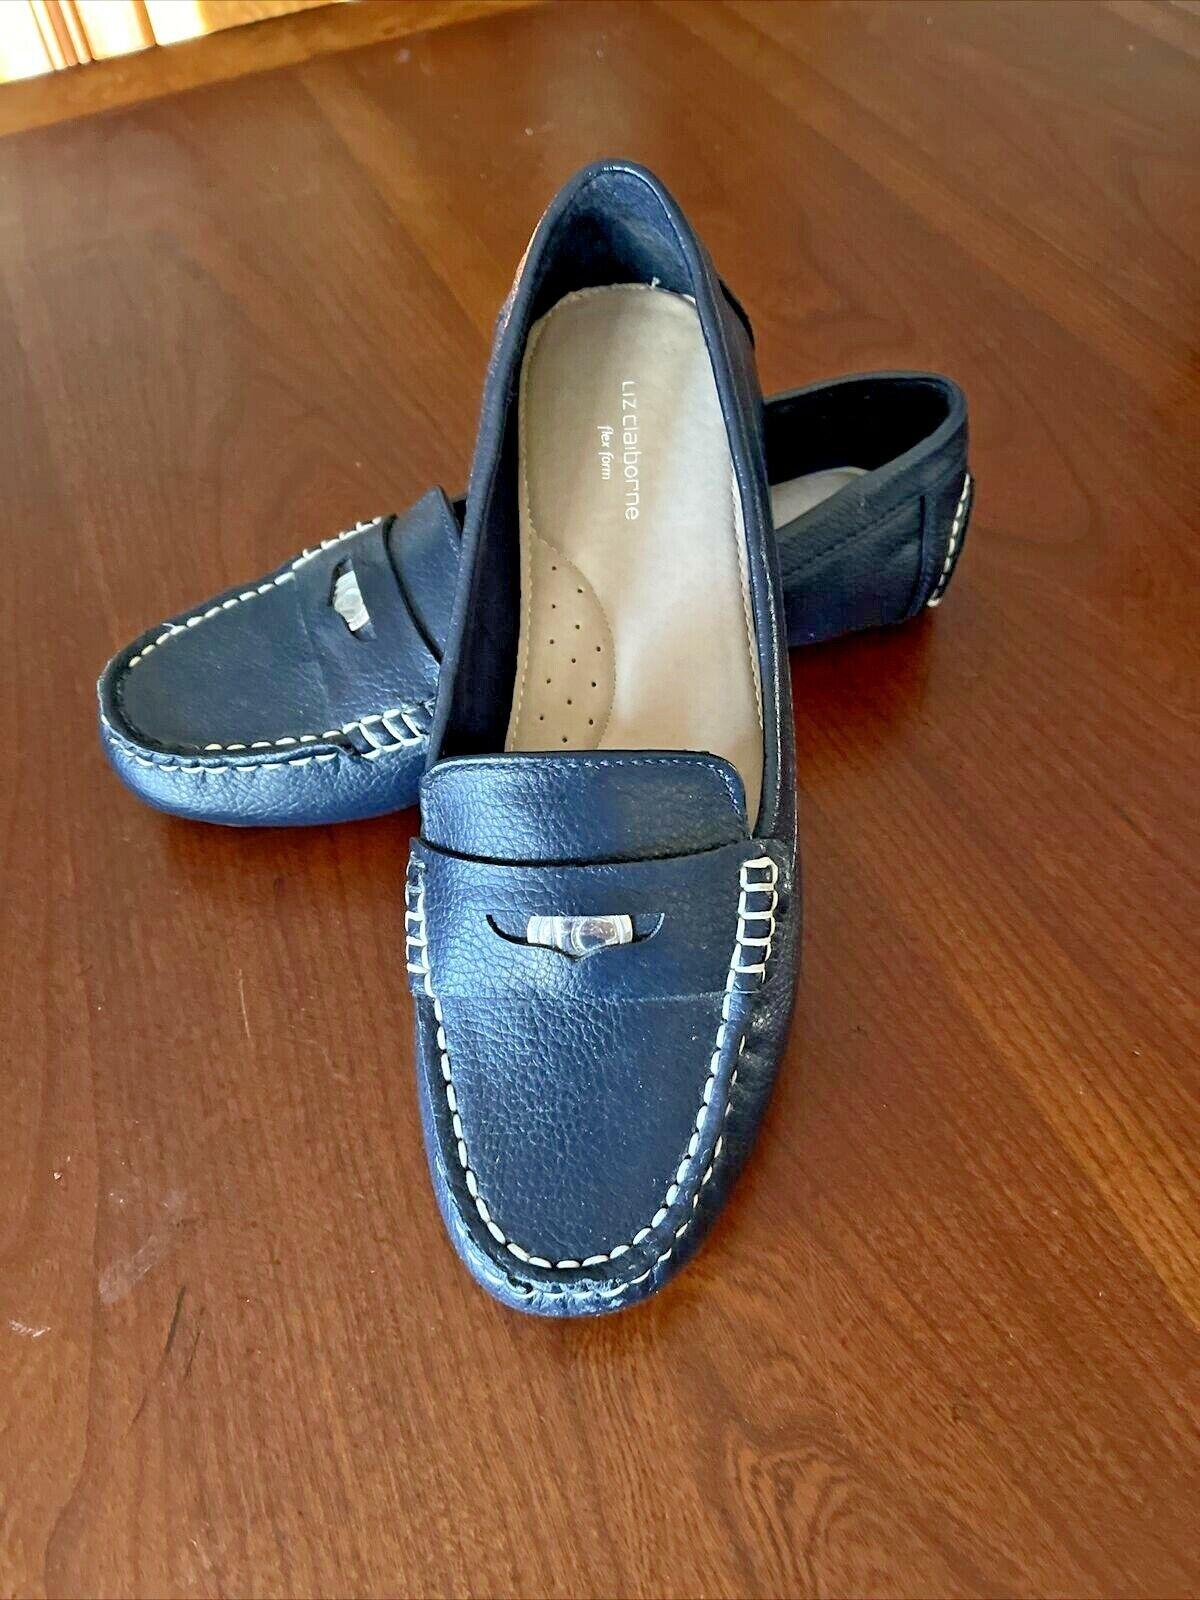 Liz Claiborne Flex Form Black Penny Loafers Size US 8 Career Women's Flats